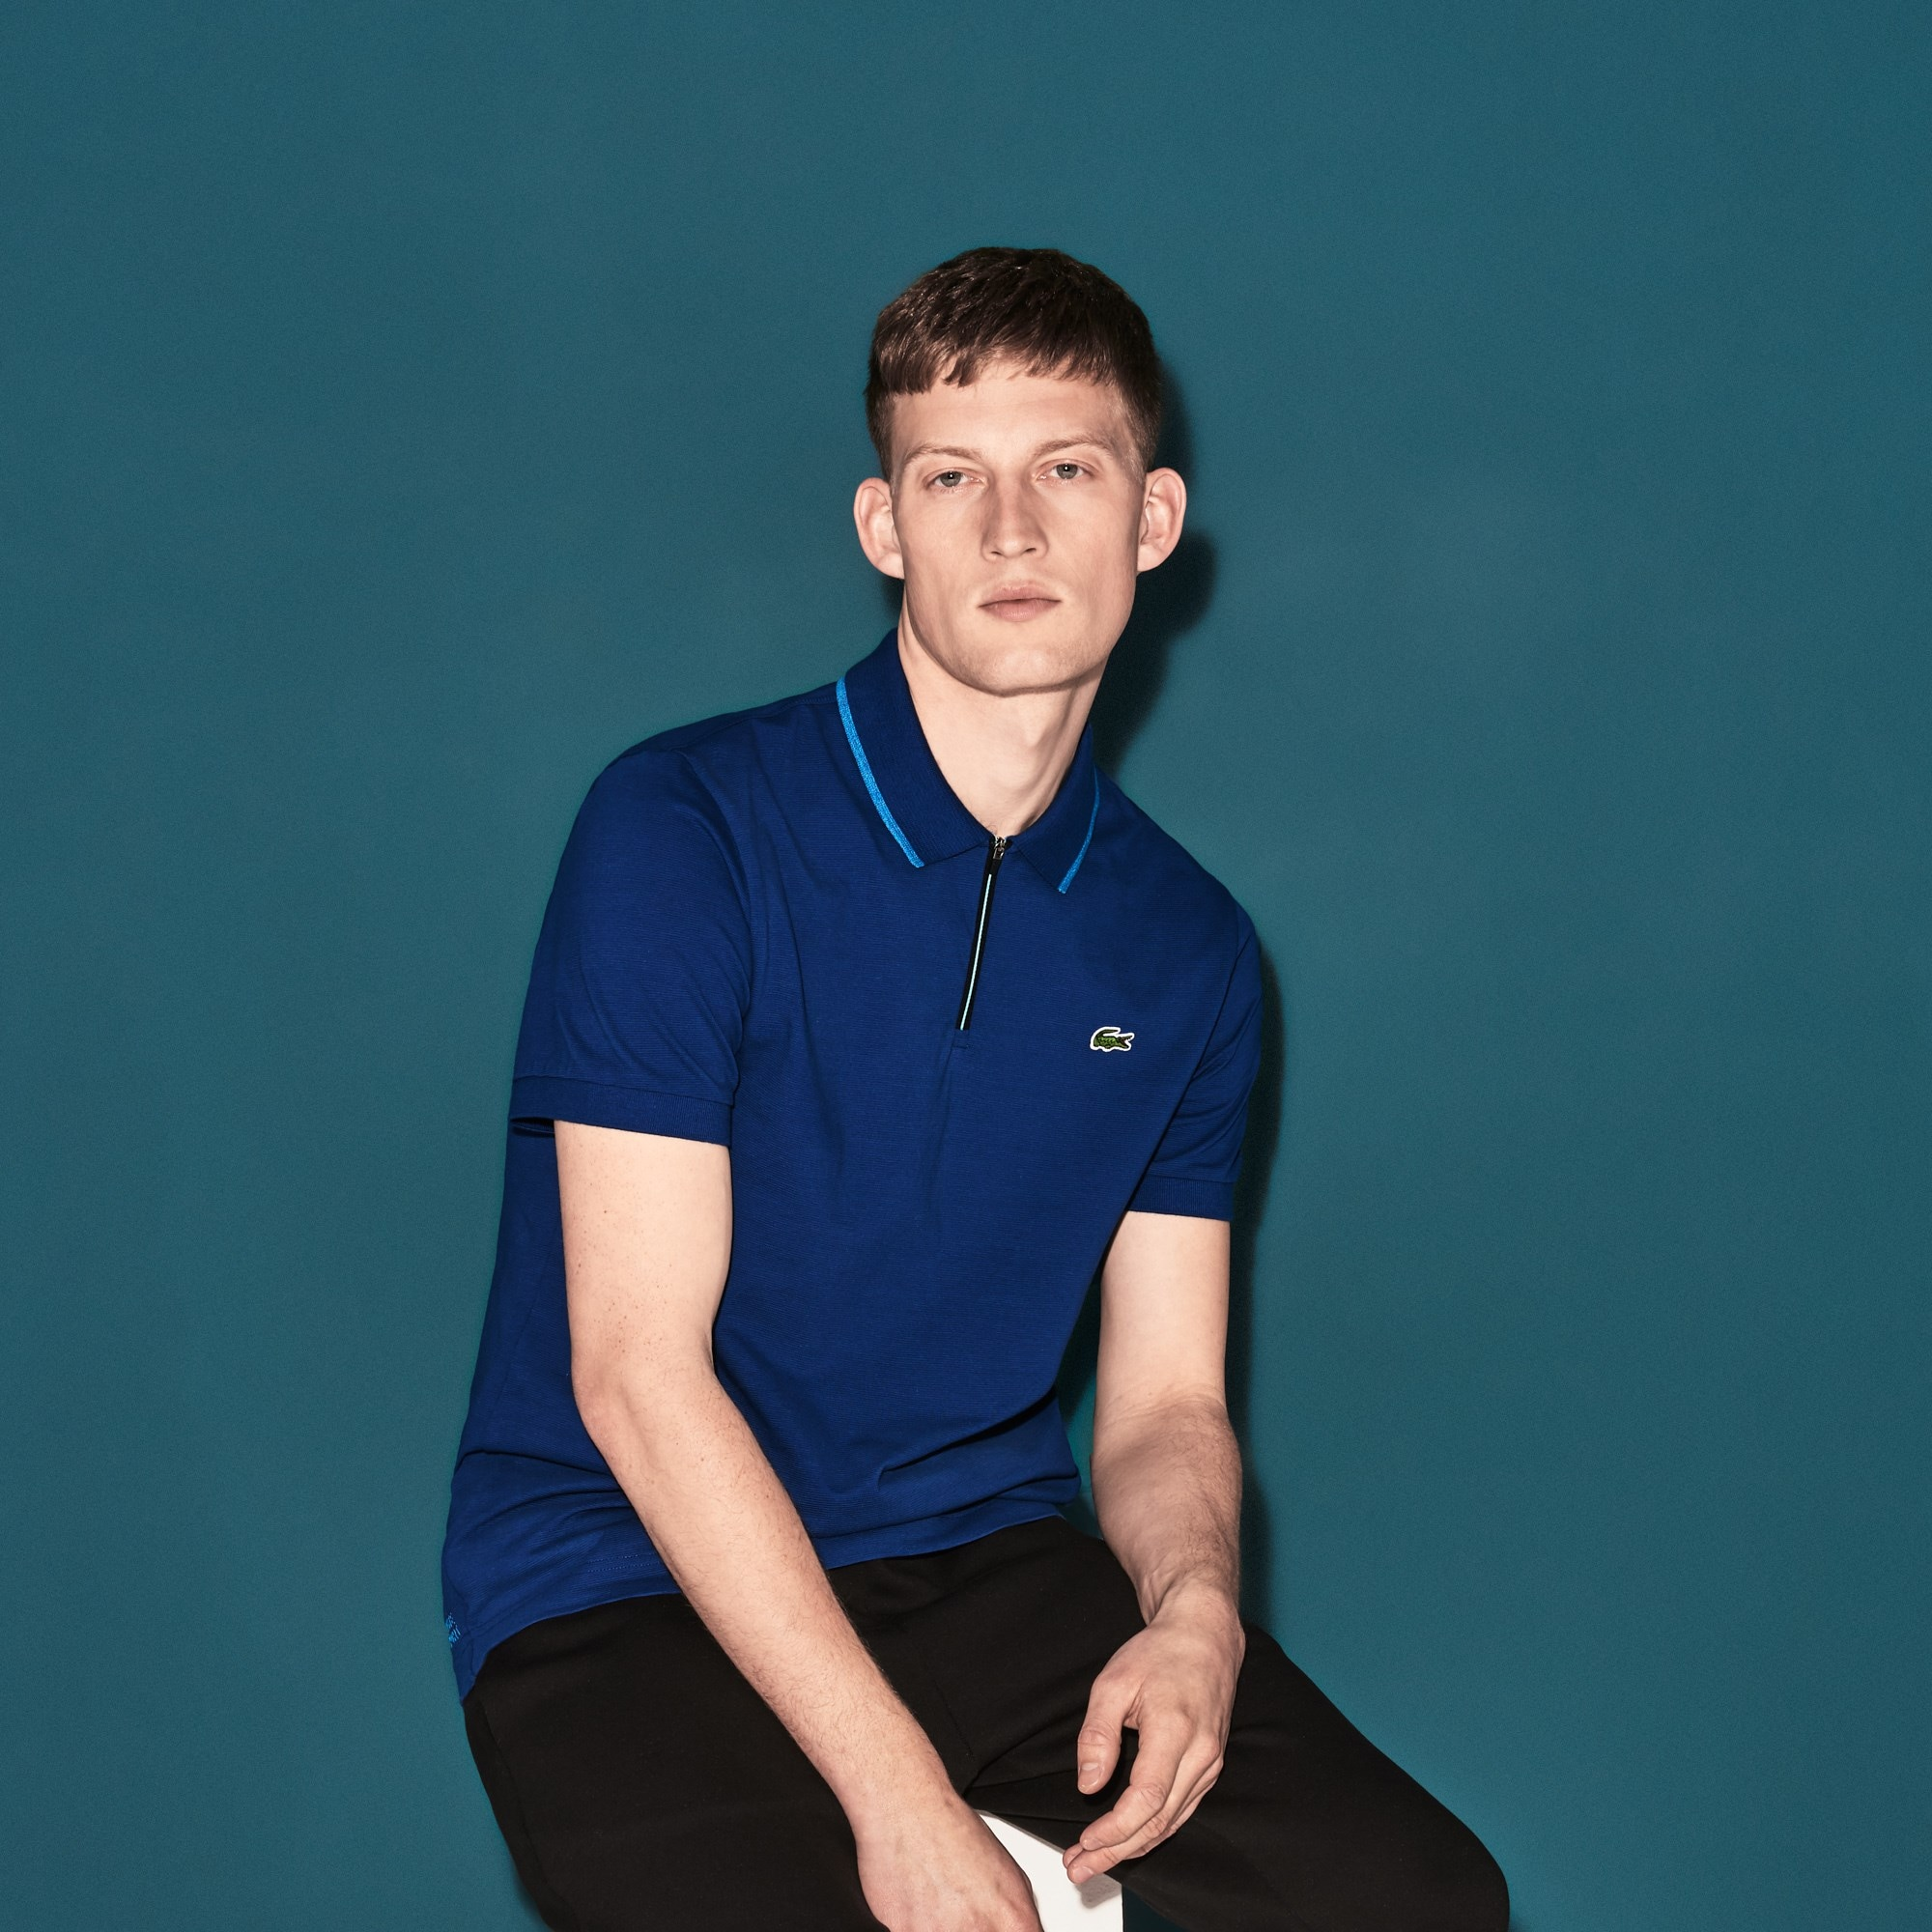 Men's Lacoste SPORT Contrast Accent Ultra-Light Cotton Tennis Polo Shirt